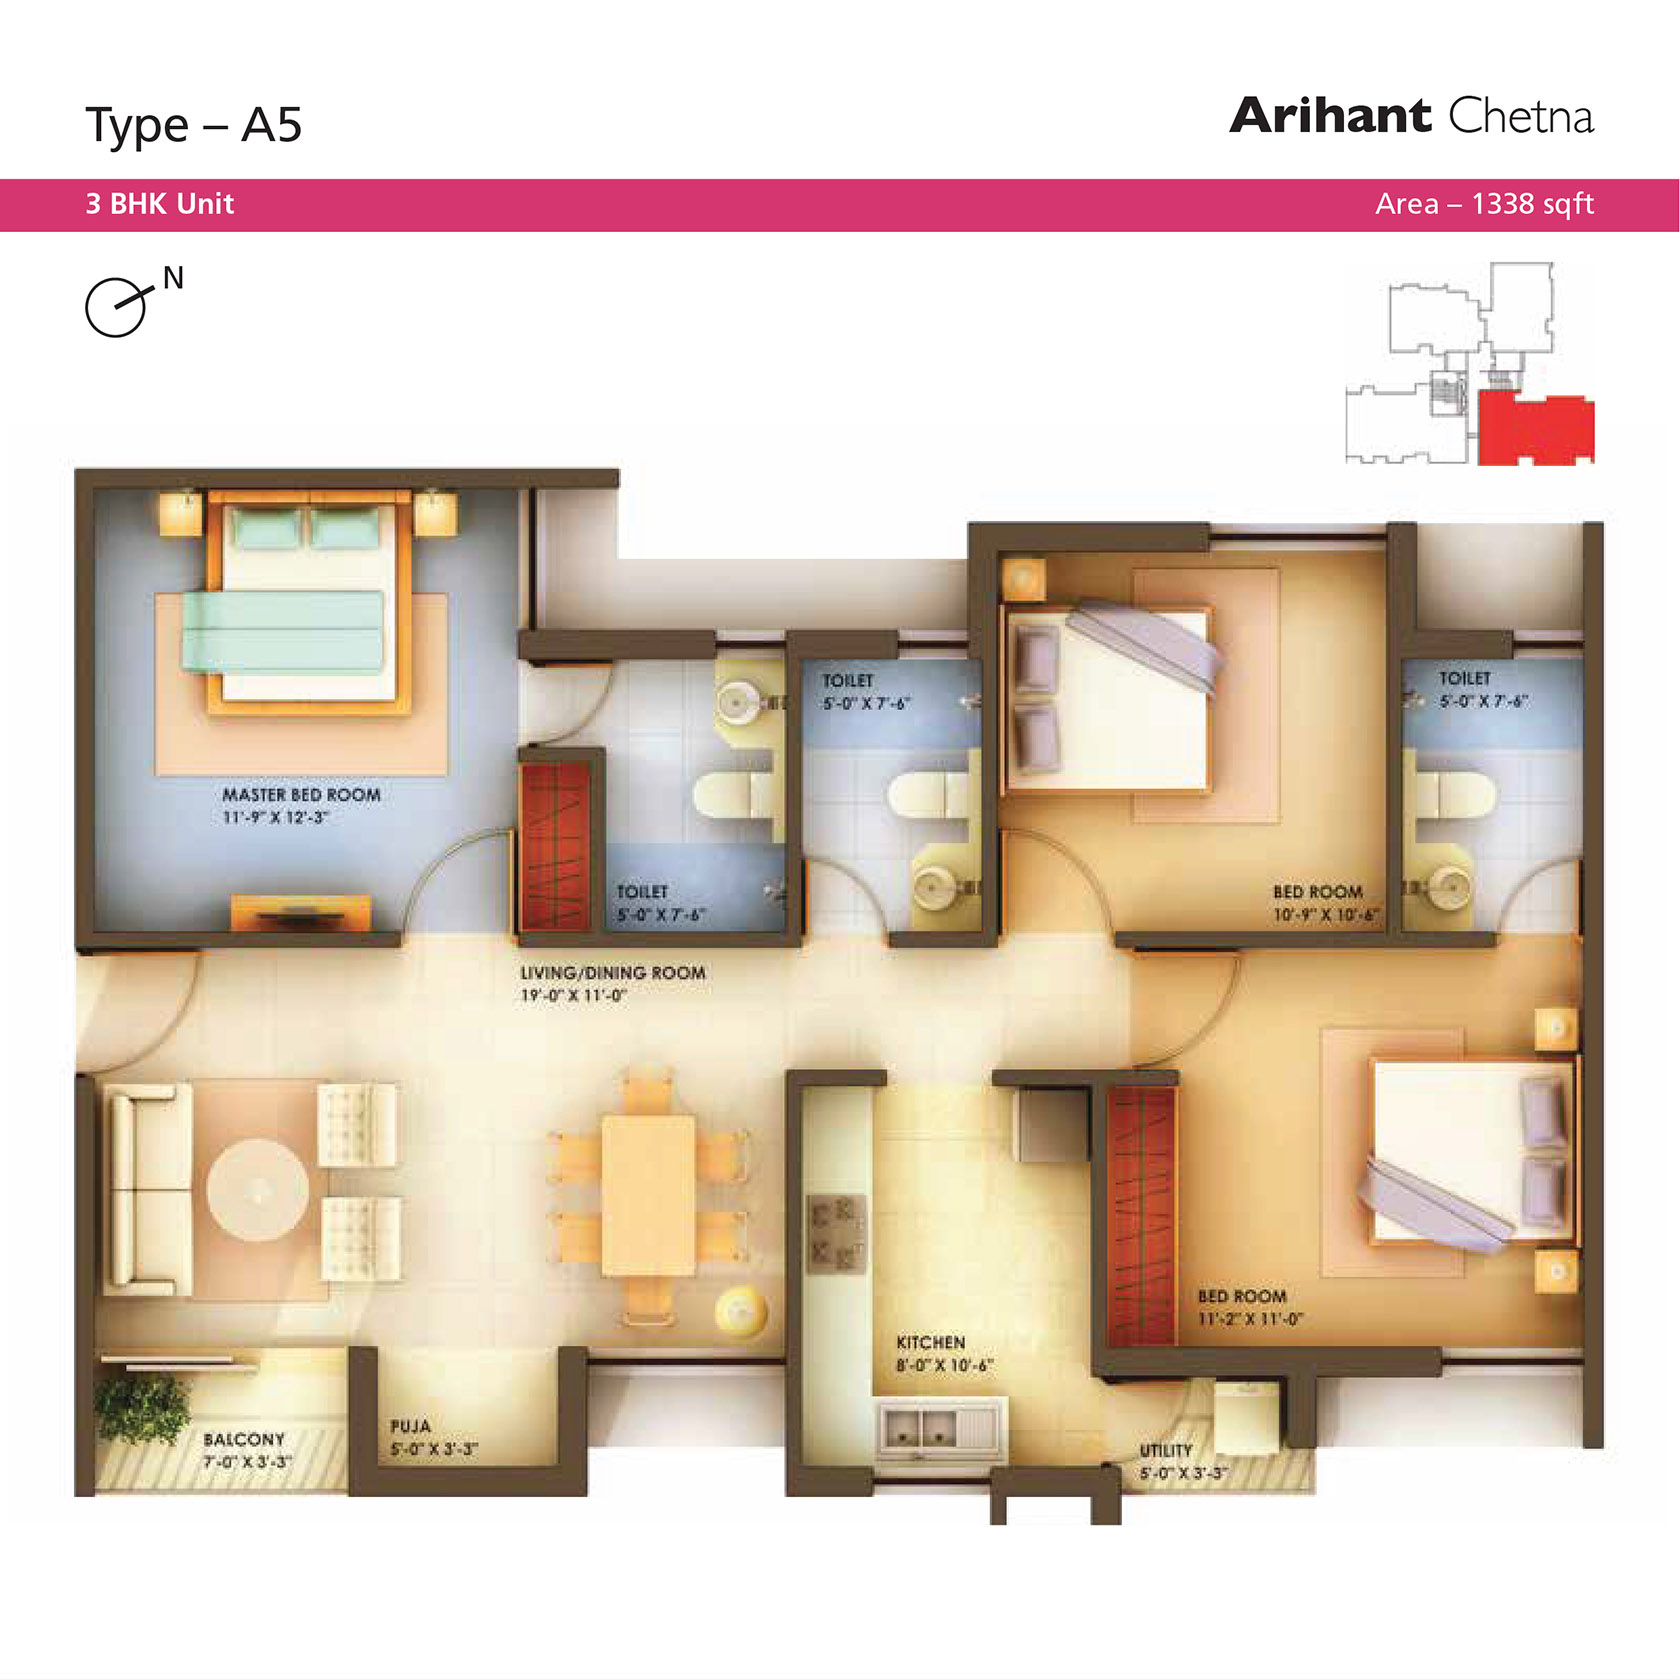 Arihant Chetna Type A5